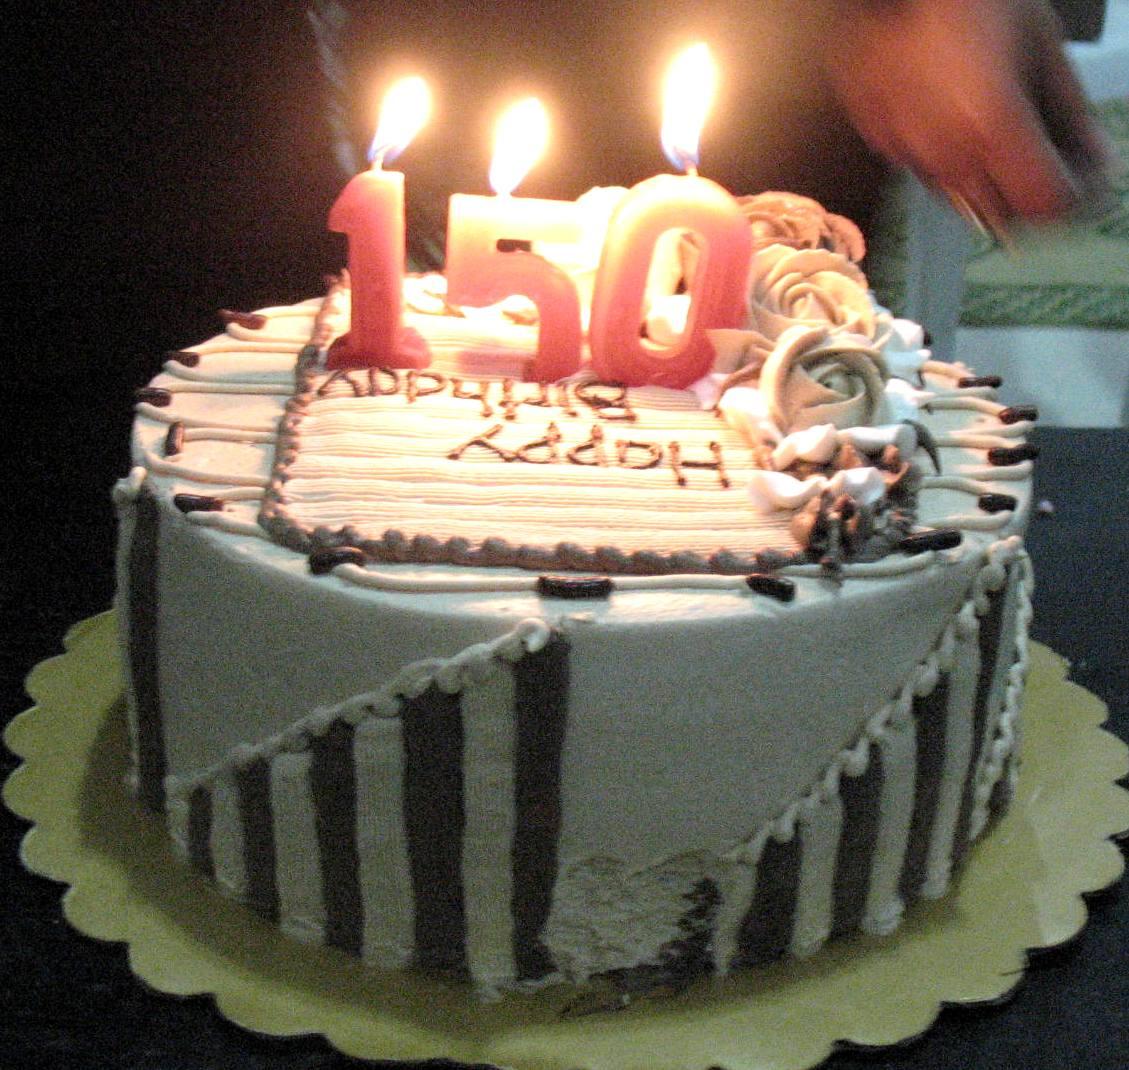 30 Nov 2010 Posts Tagged 'resep dan gambar kue tart' extreme ...